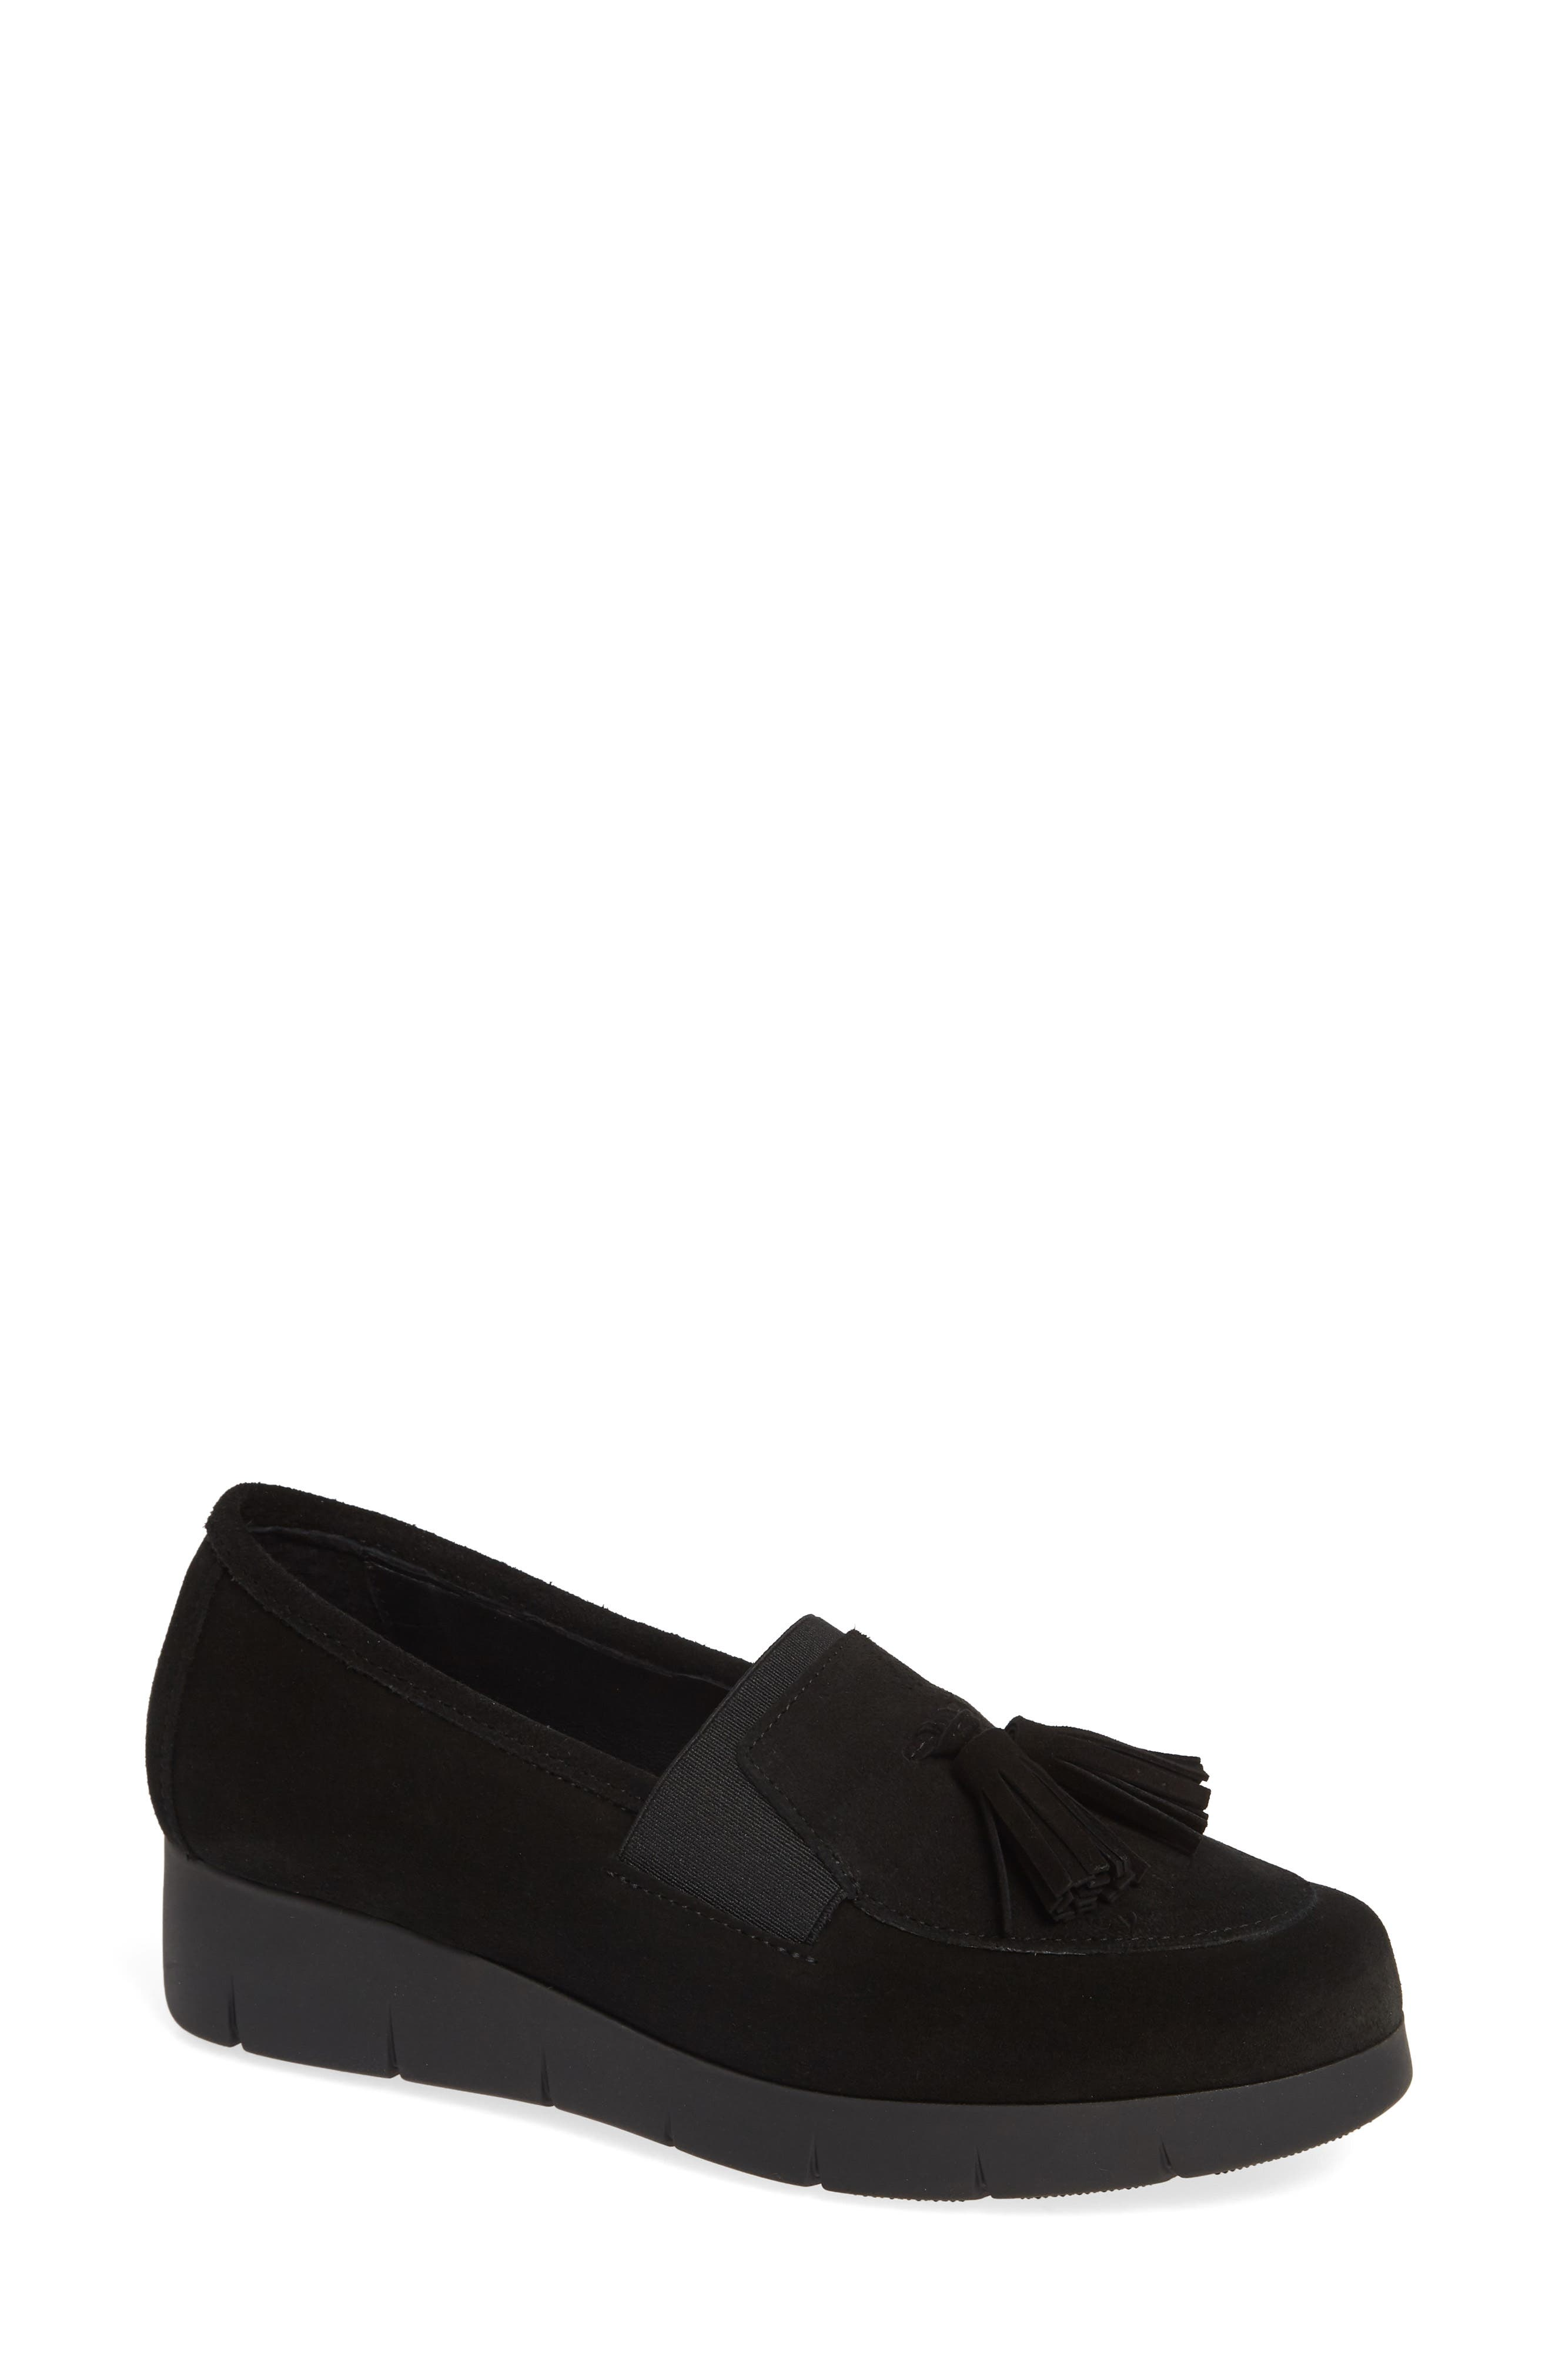 Cordani Alias Water-Resistant Loafer, Black